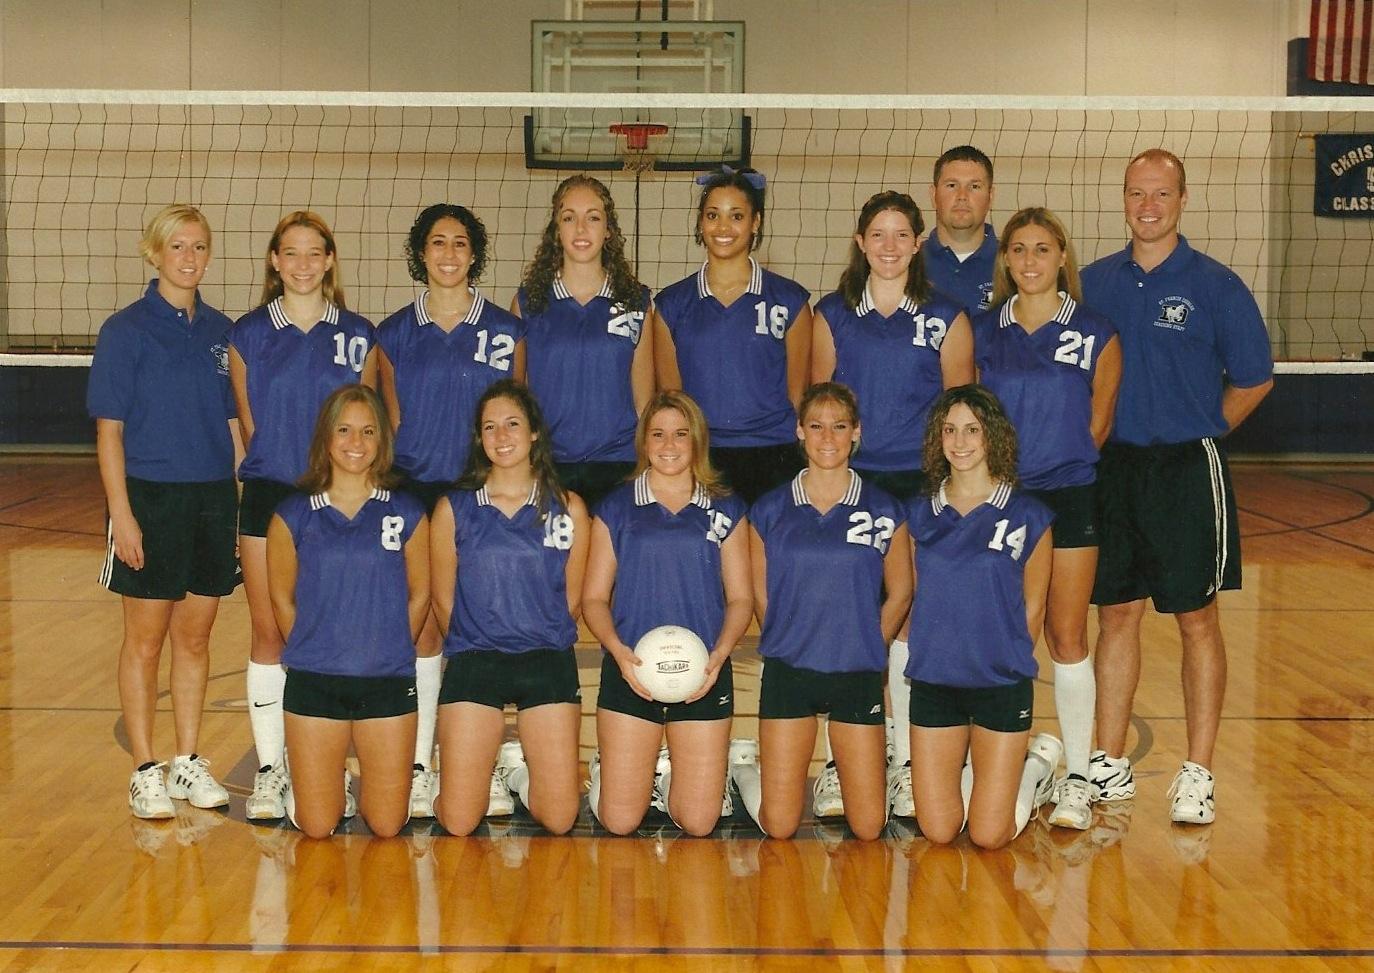 2004 Girls Volleyball